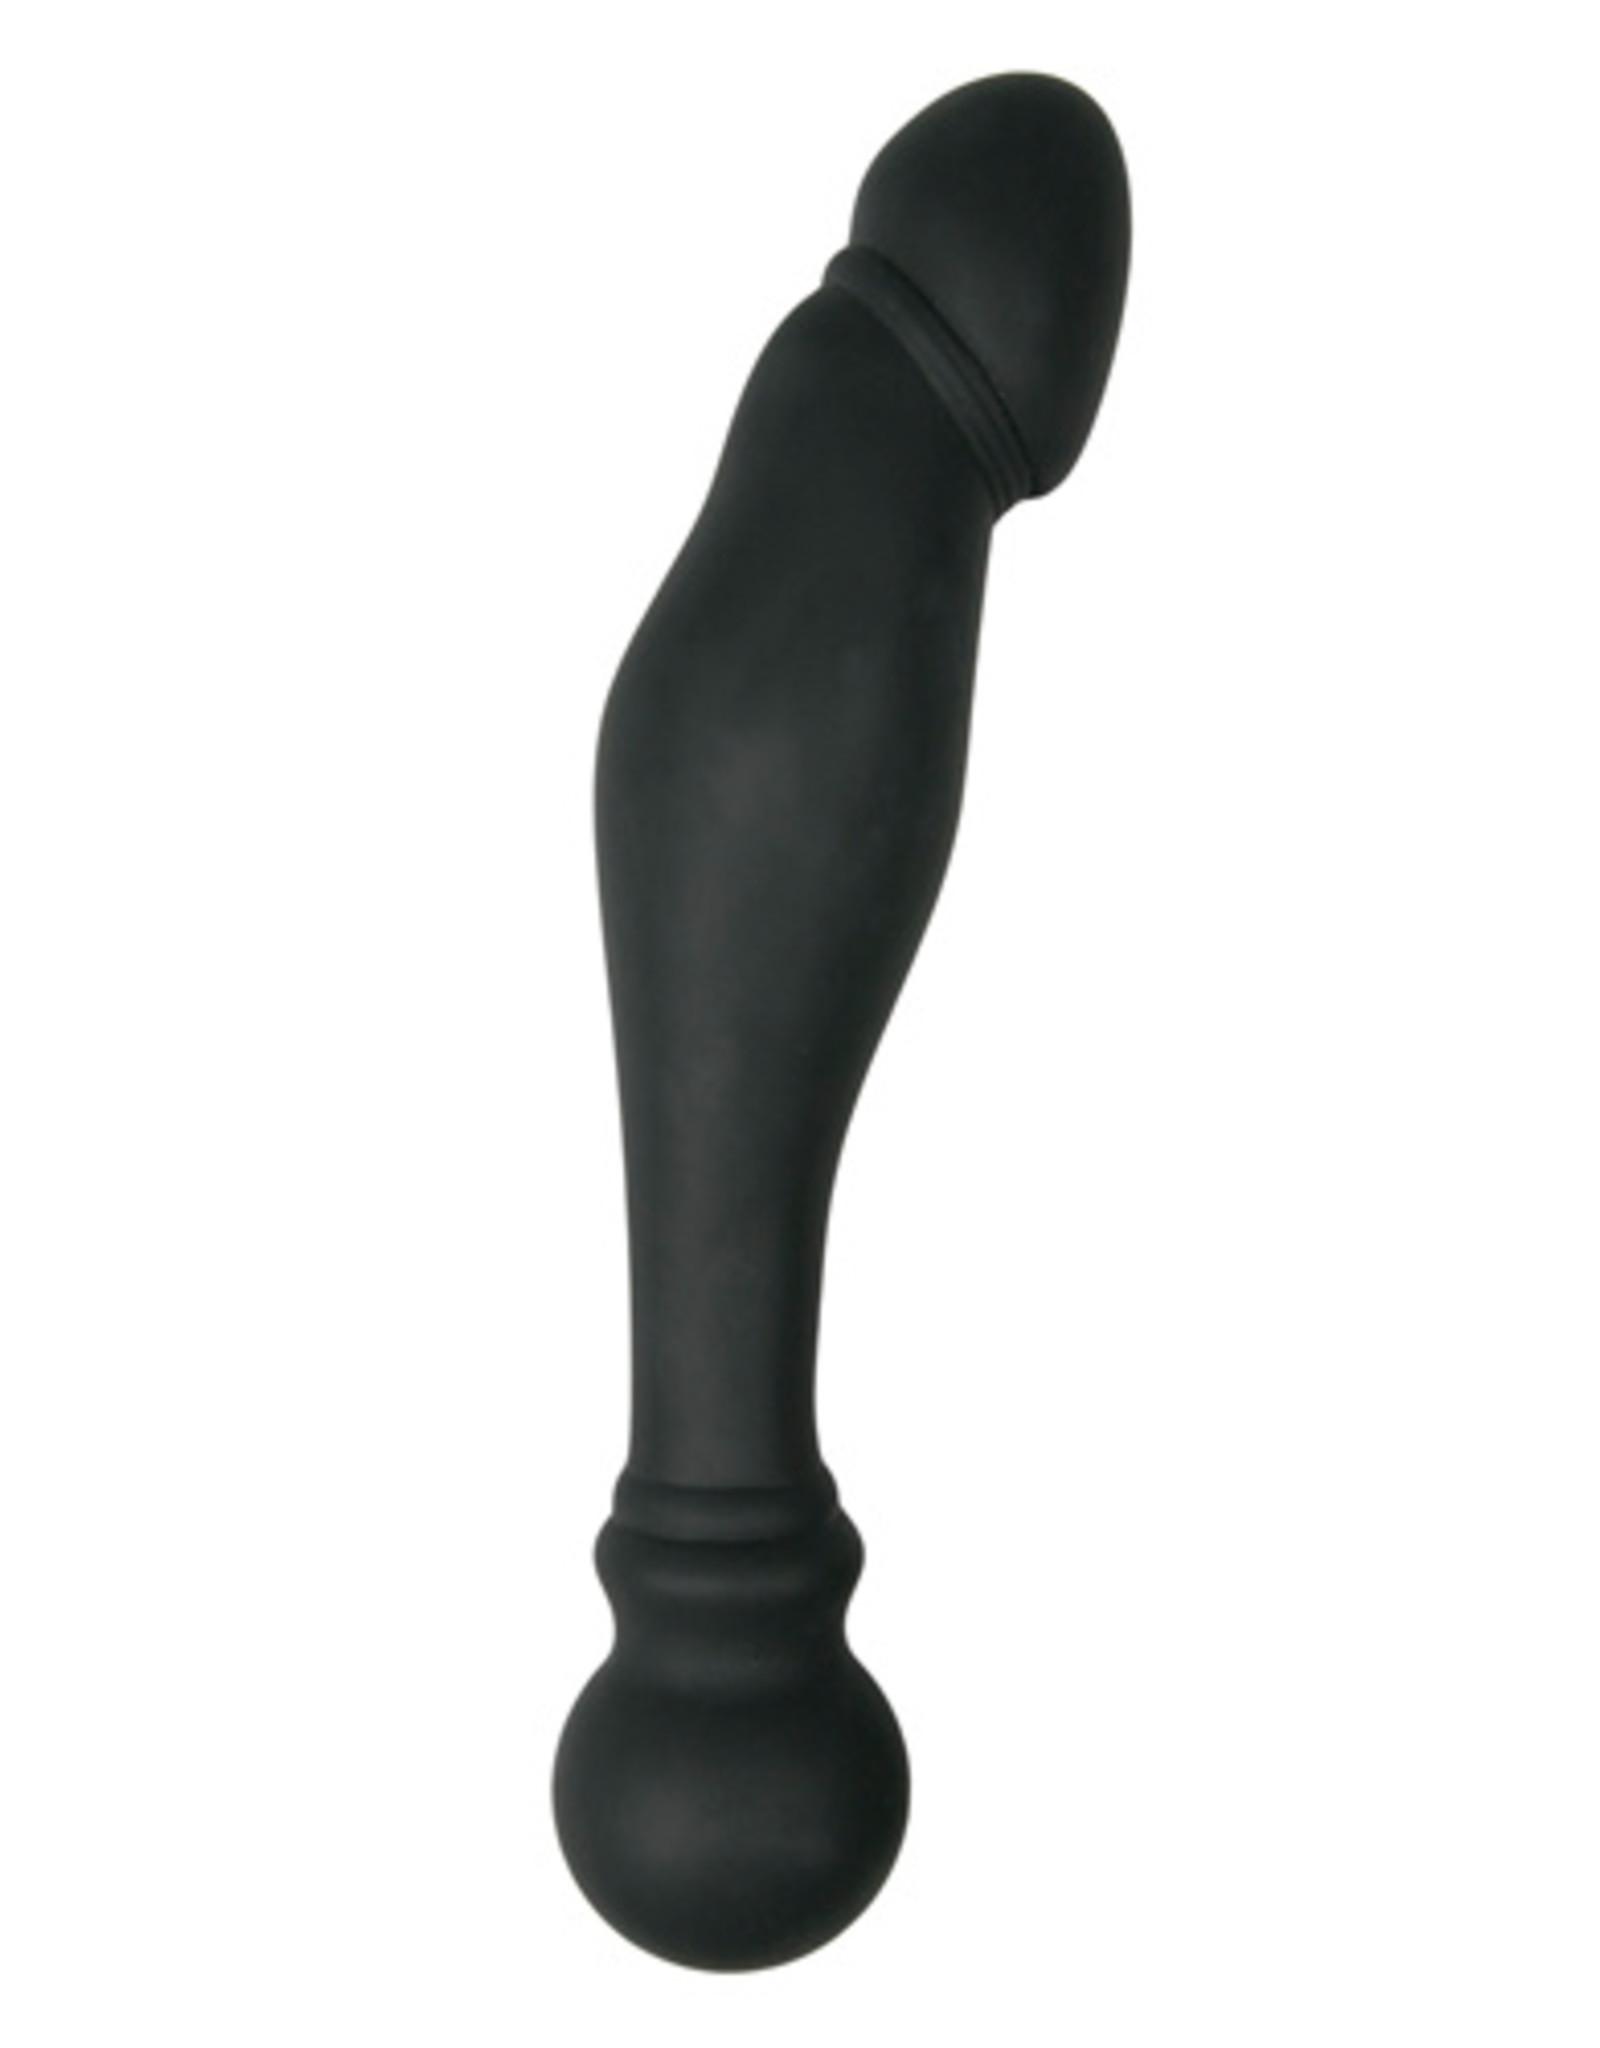 Easytoys Anal Collection Anal Probe Prostaat Dildo No.2